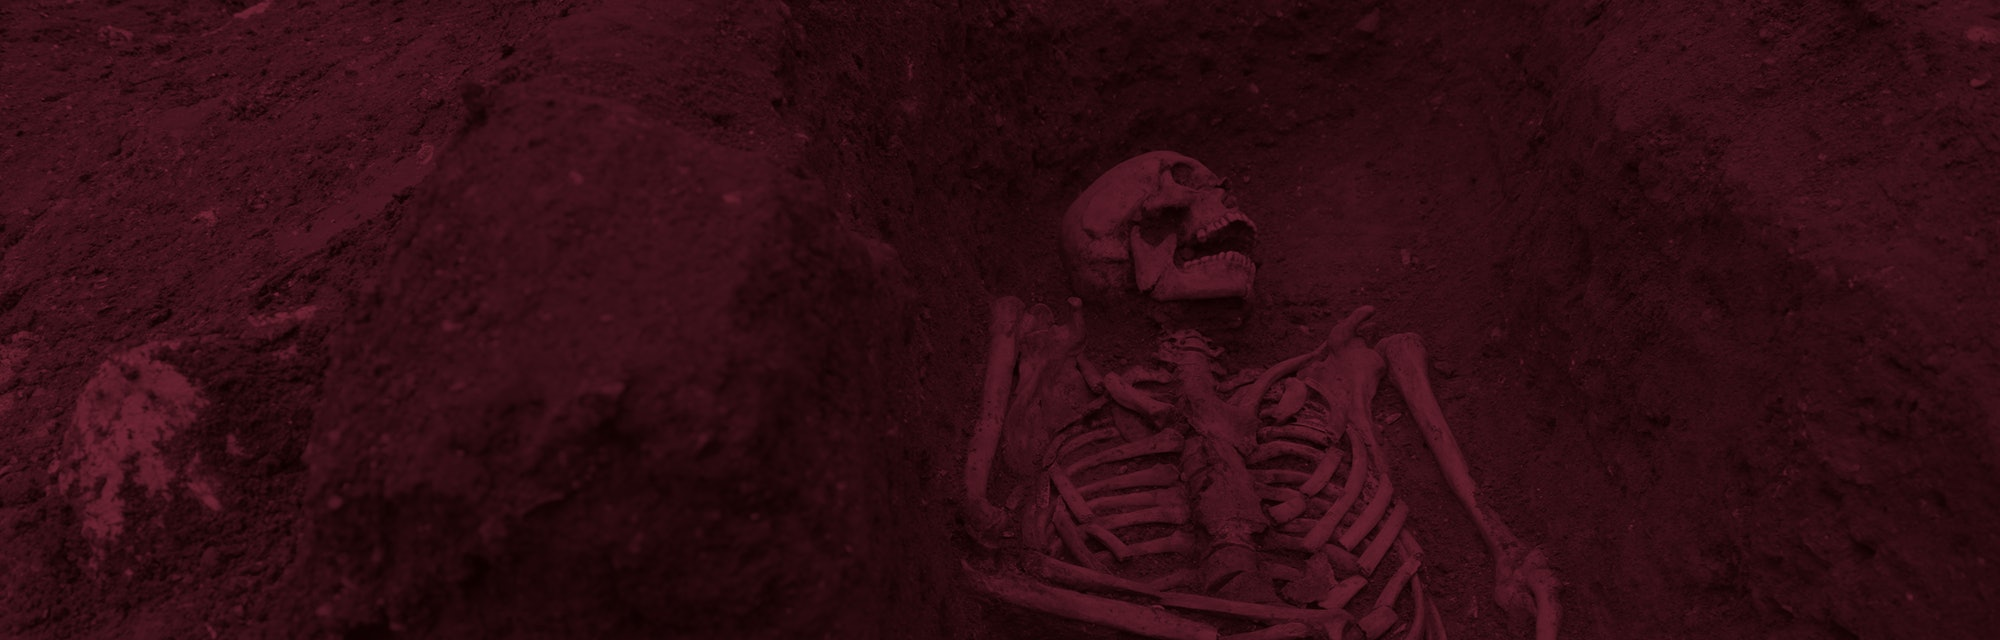 cambridge skeleton from medieval england